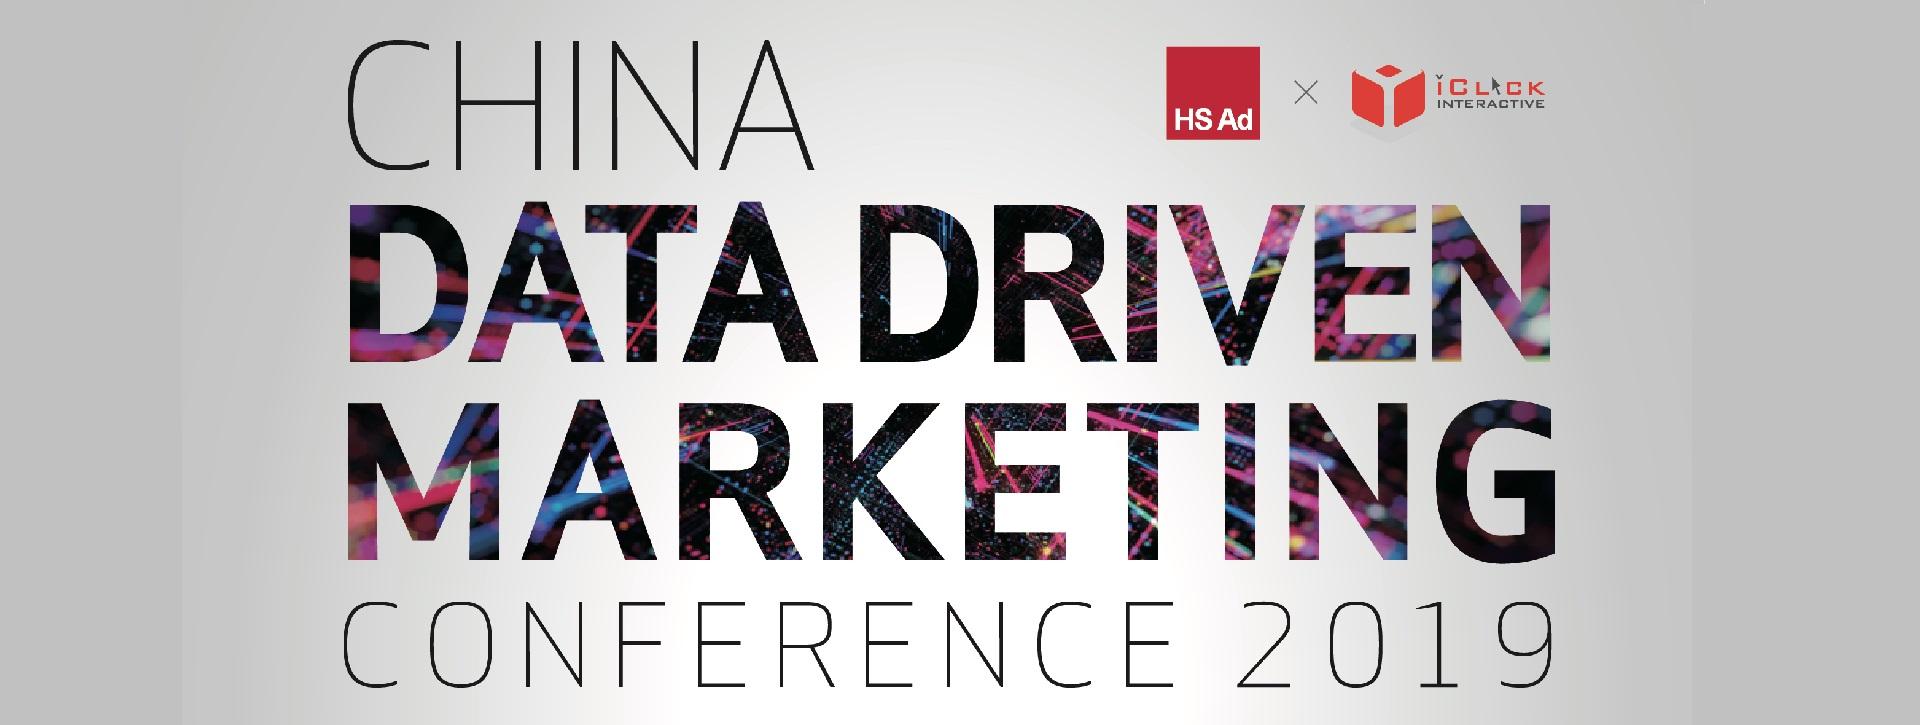 iClick x HS Ad China Data Driven Marketing Conference 2019